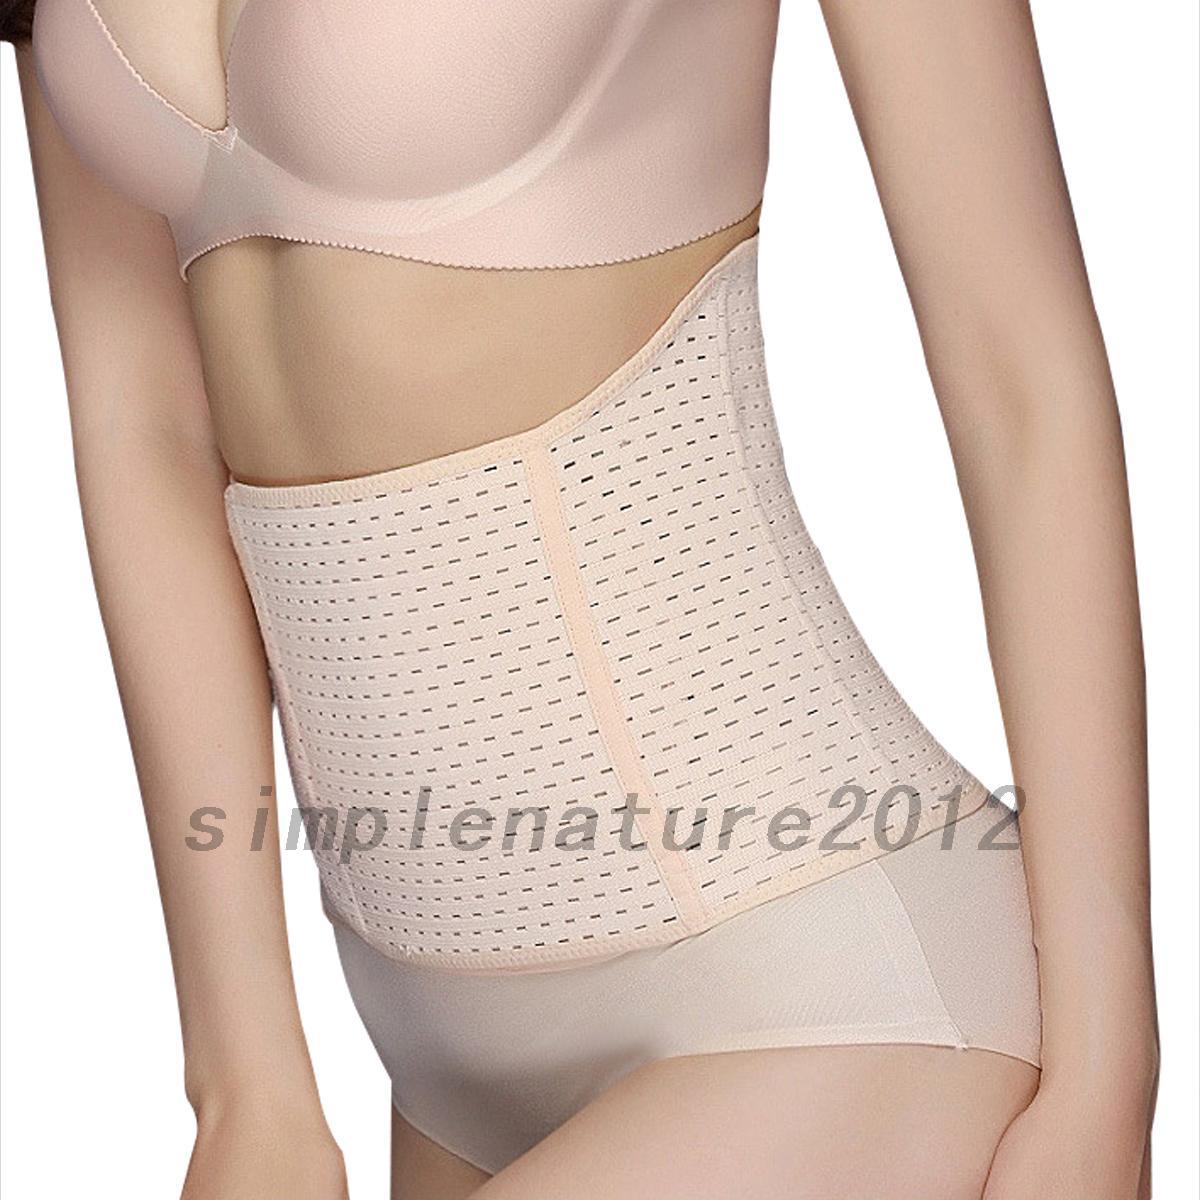 Adjustable-Postpartum-Recovery-Belly-Abdomen-Waist-Slimming-Shaper-Wrapper-Belt